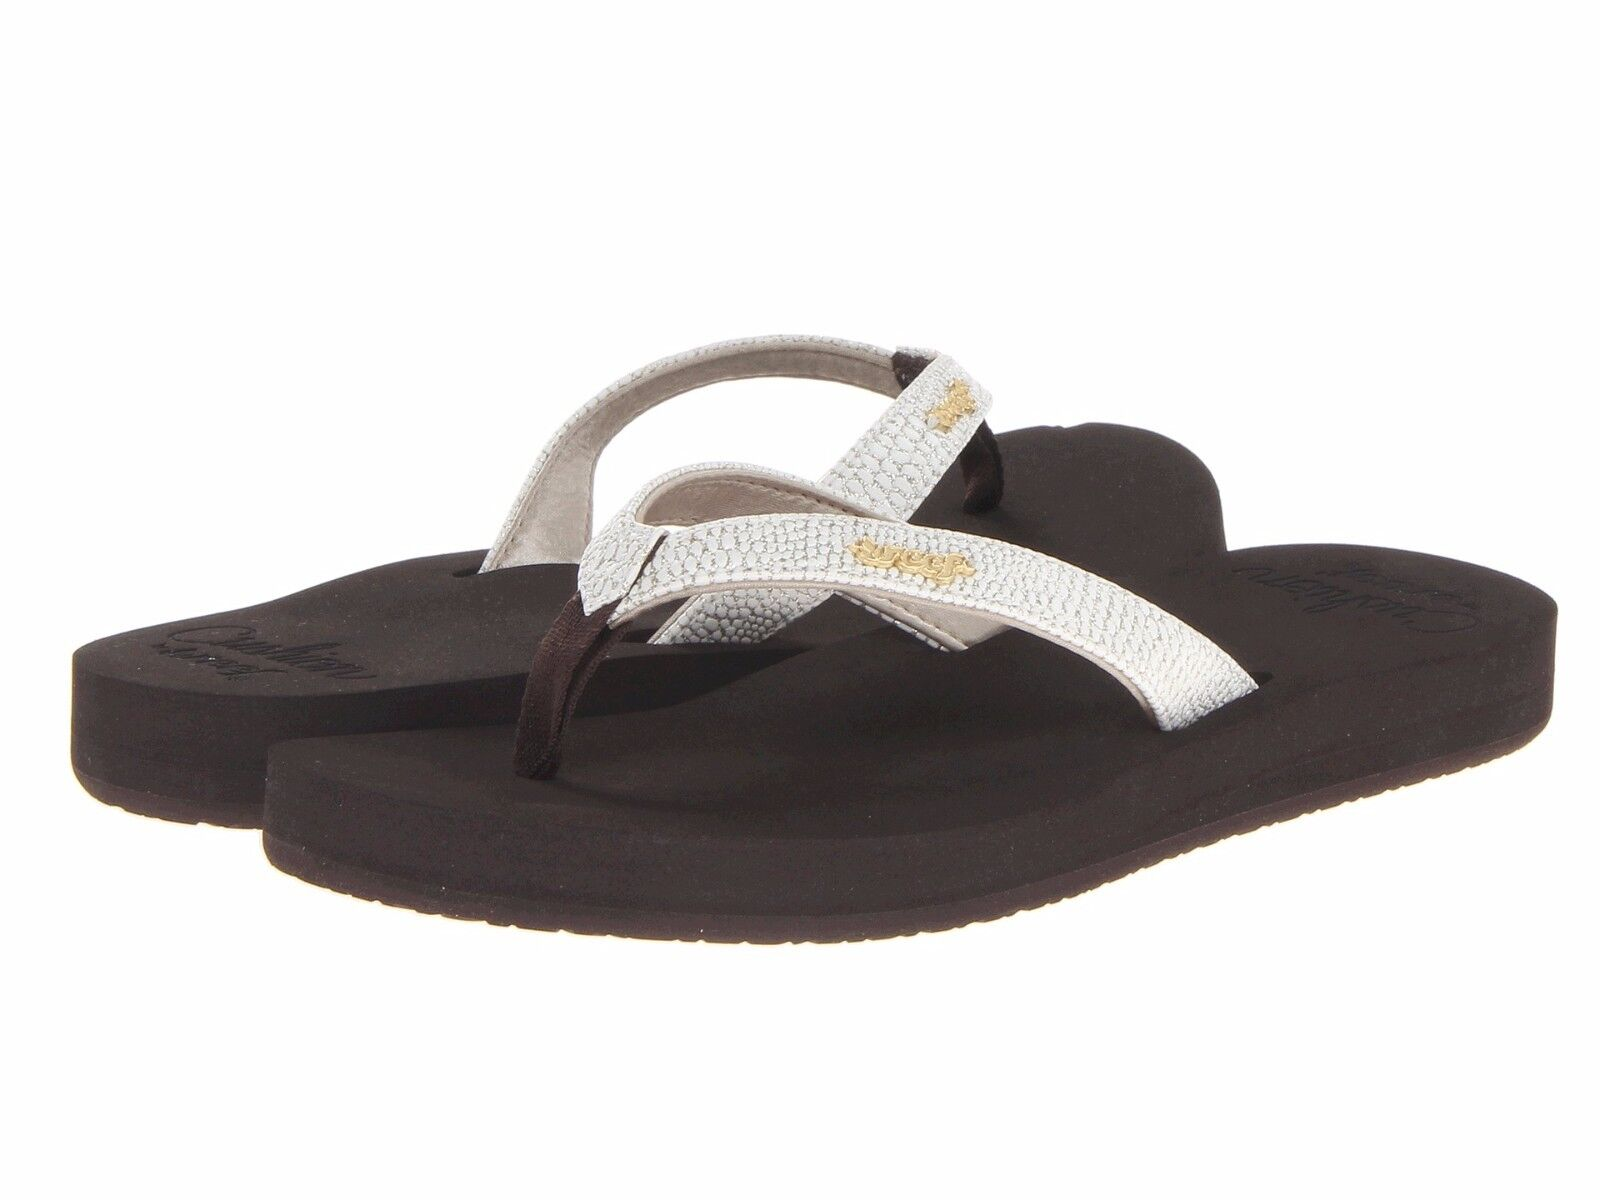 Women's Shoes Reef Star Cushion Sassy Sandals RF001384 Brown